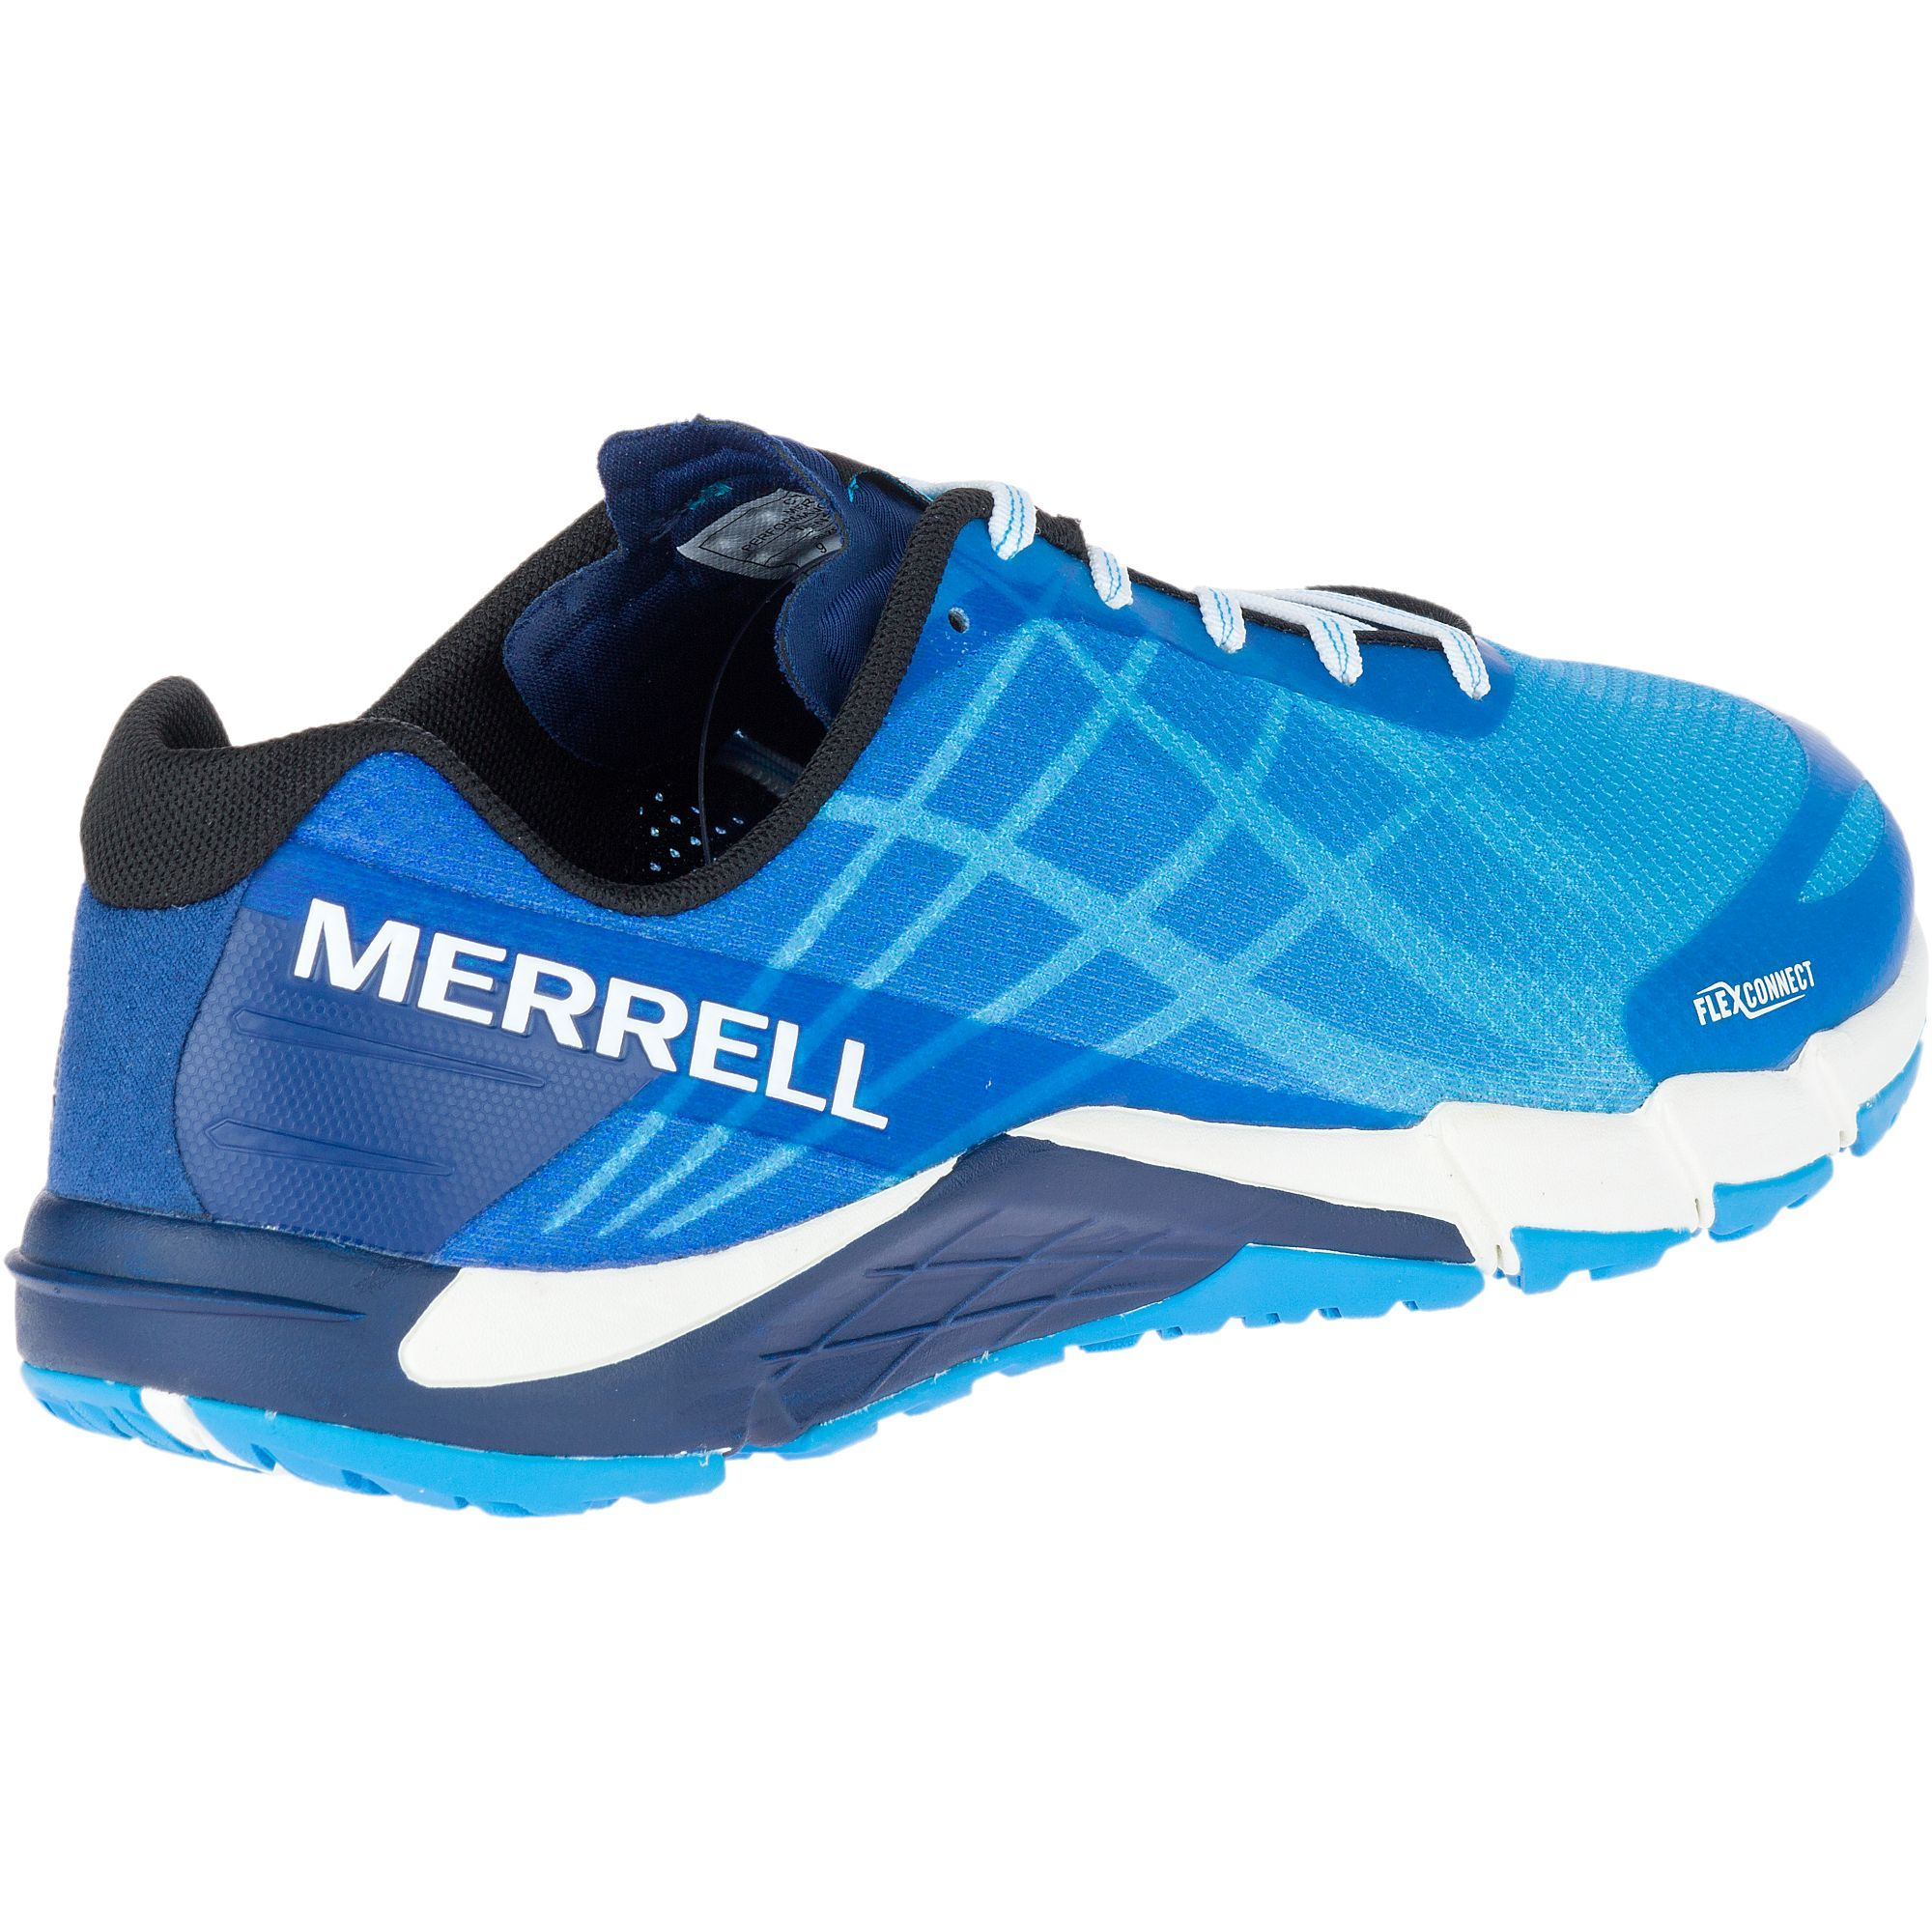 Merrell Bare Access  Mens Running Shoes